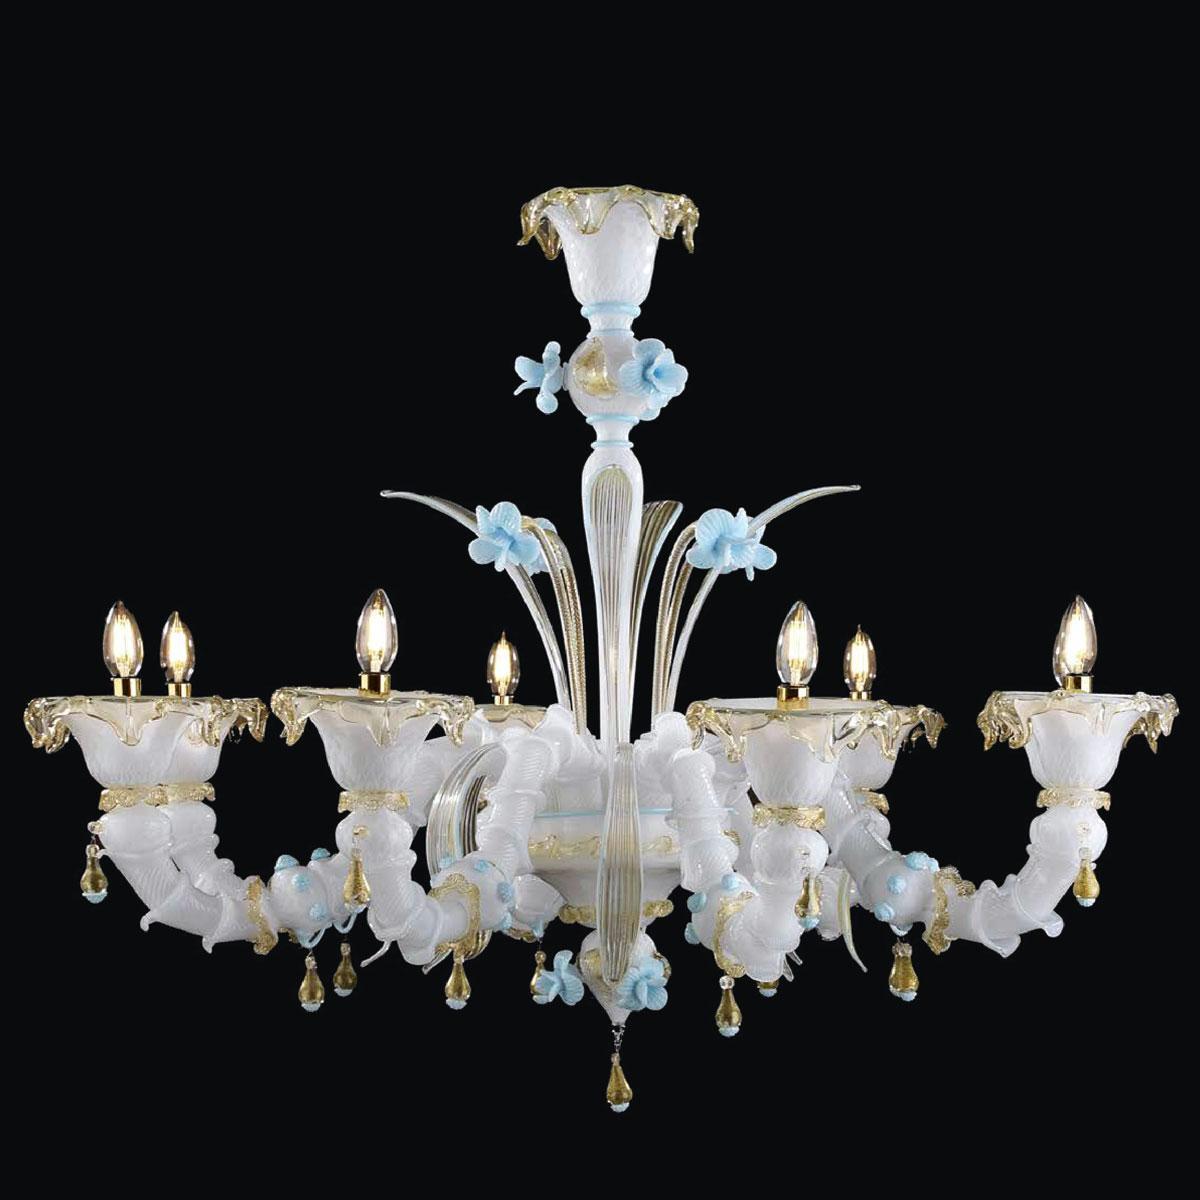 """Leja"" Murano glass chandelier  - 8 lights - white and gold"